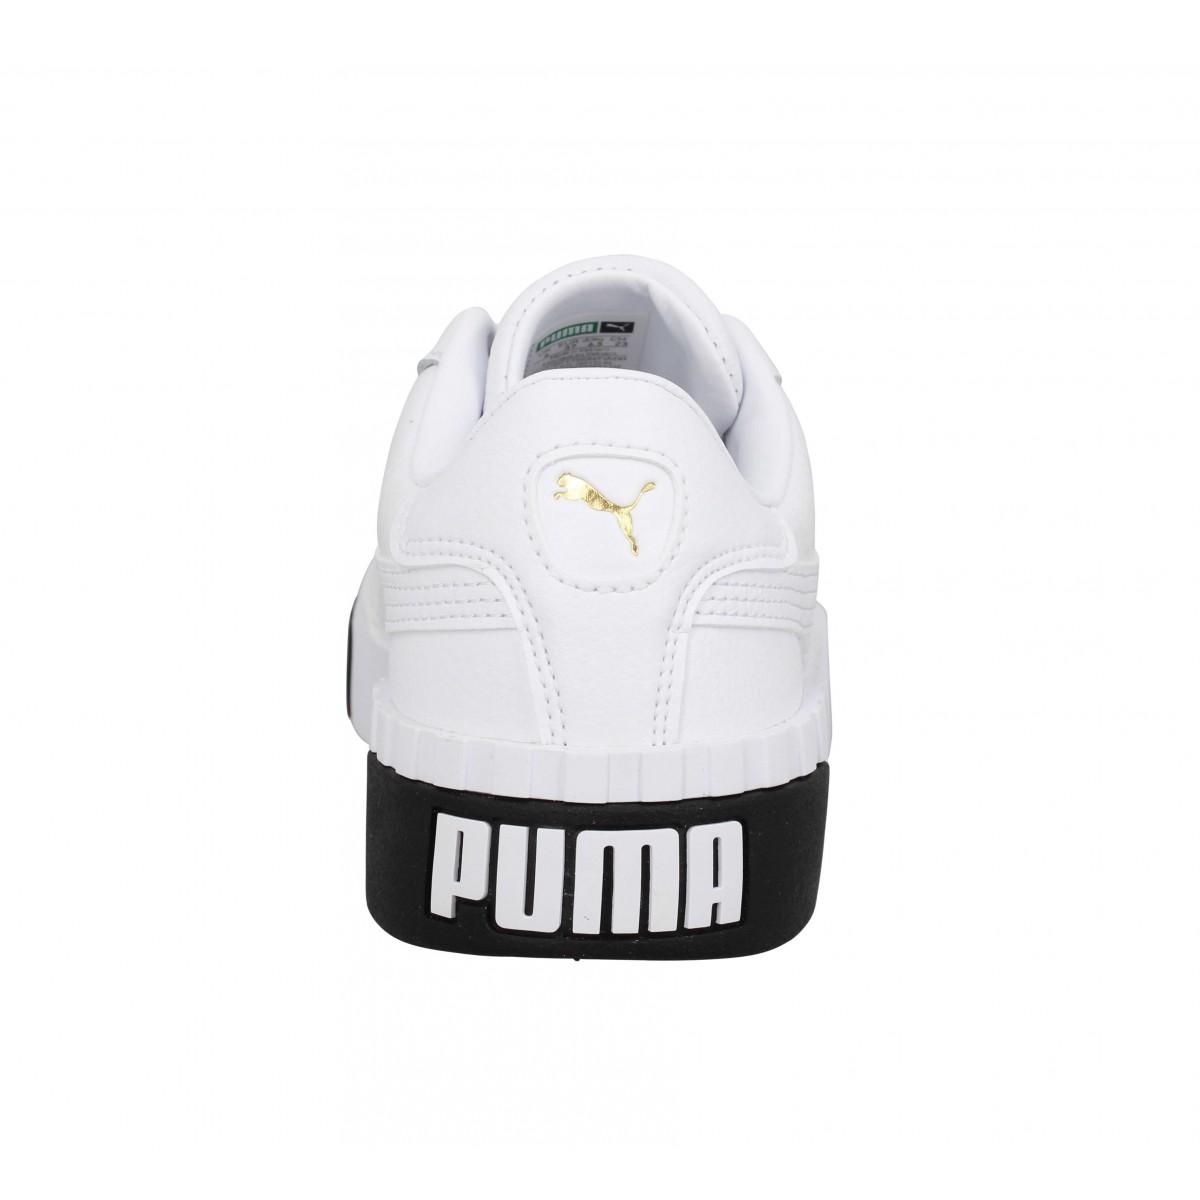 puma blanche cuir femme